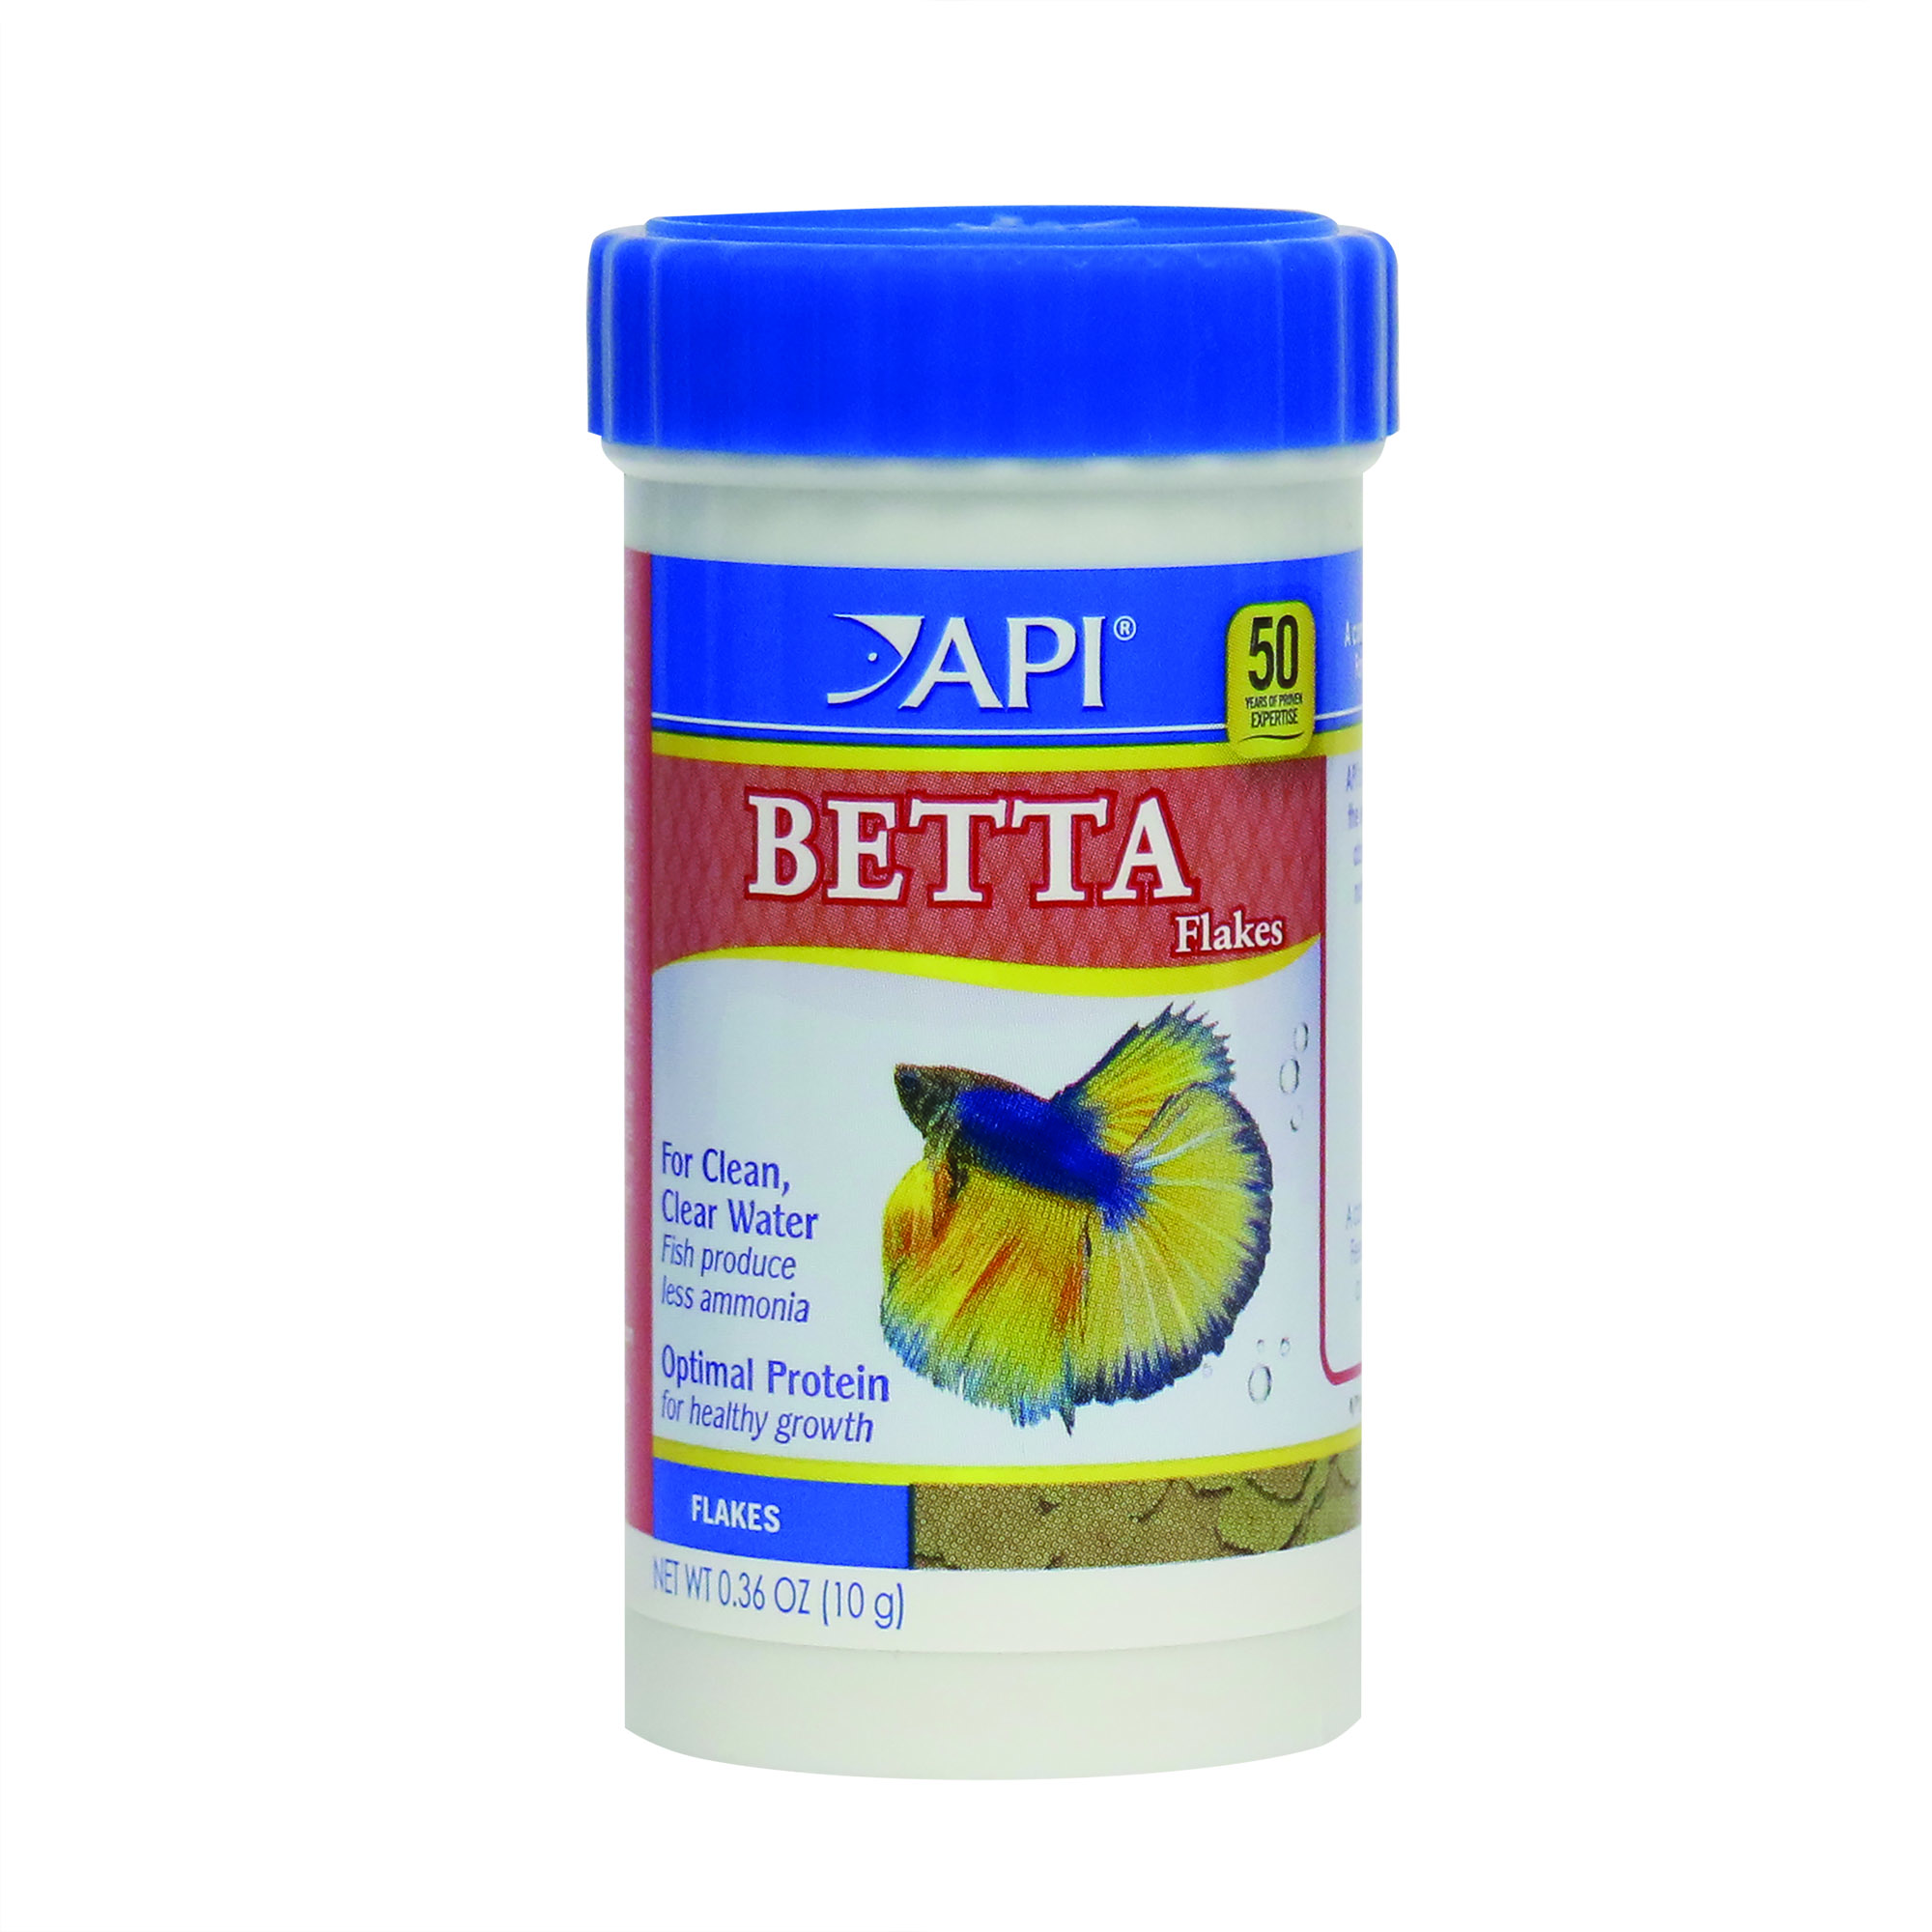 BETTA FLAKES